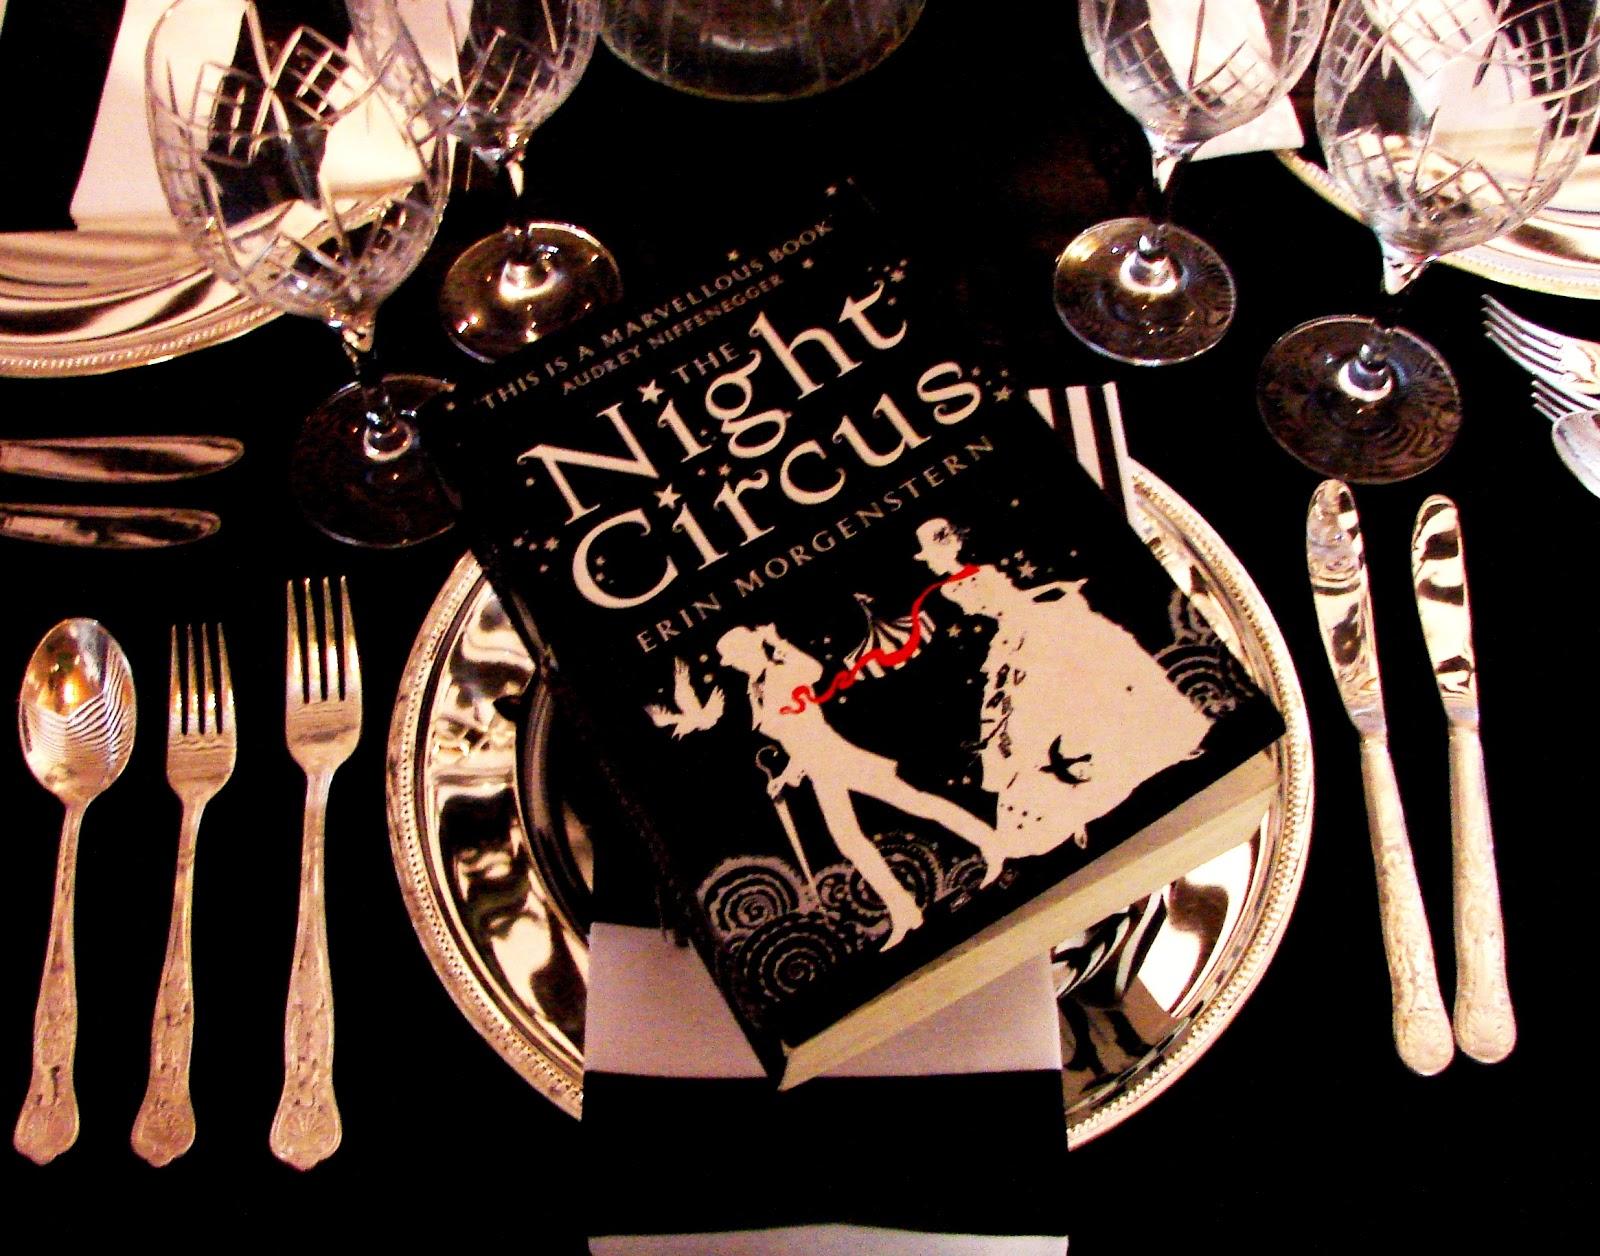 Moerby Kultuur The Night Circus